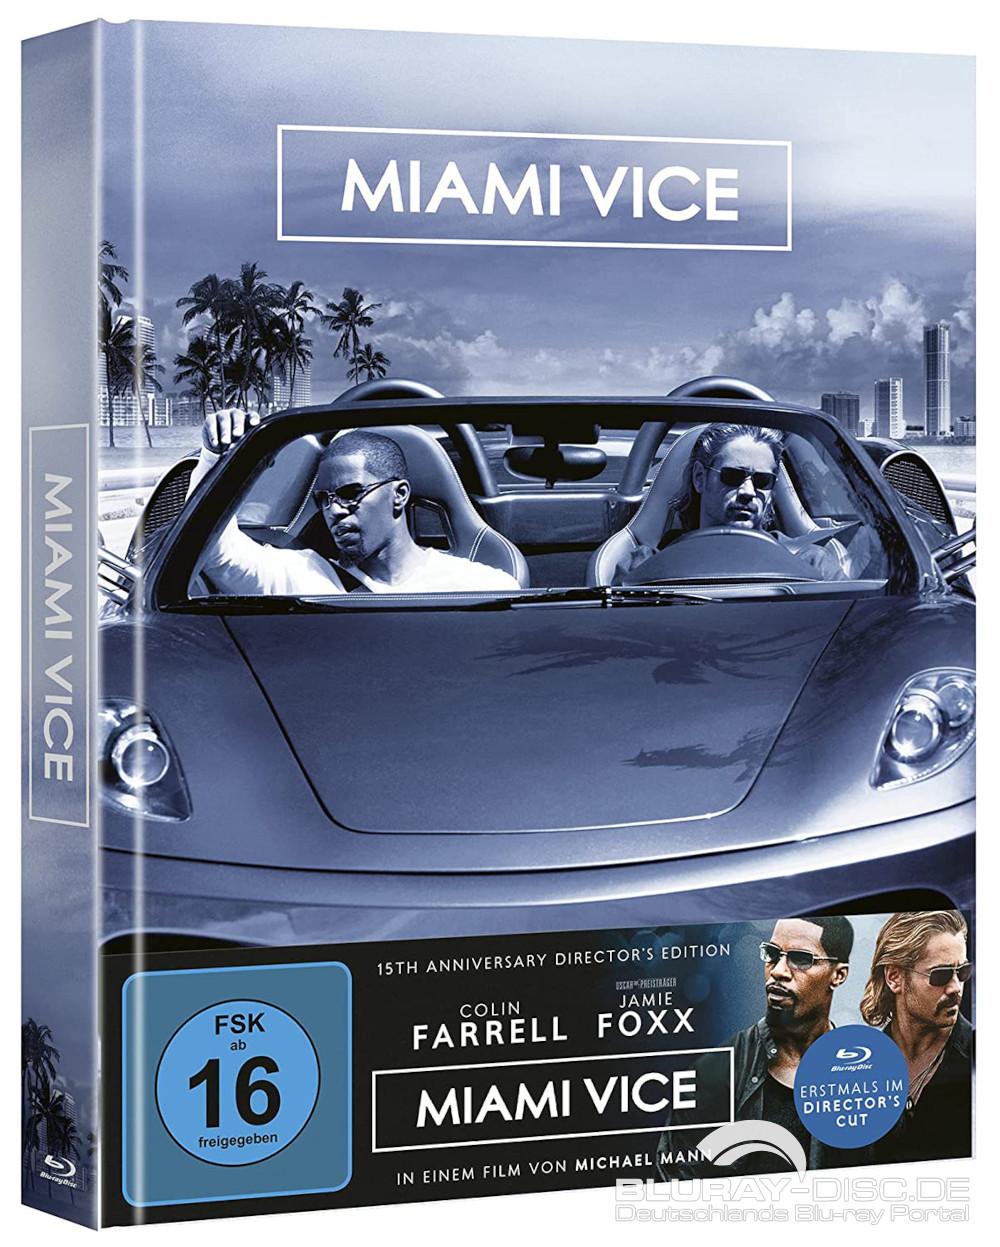 Miami-Vice-Mediabook-Cover-A-Galerie-01.jpg